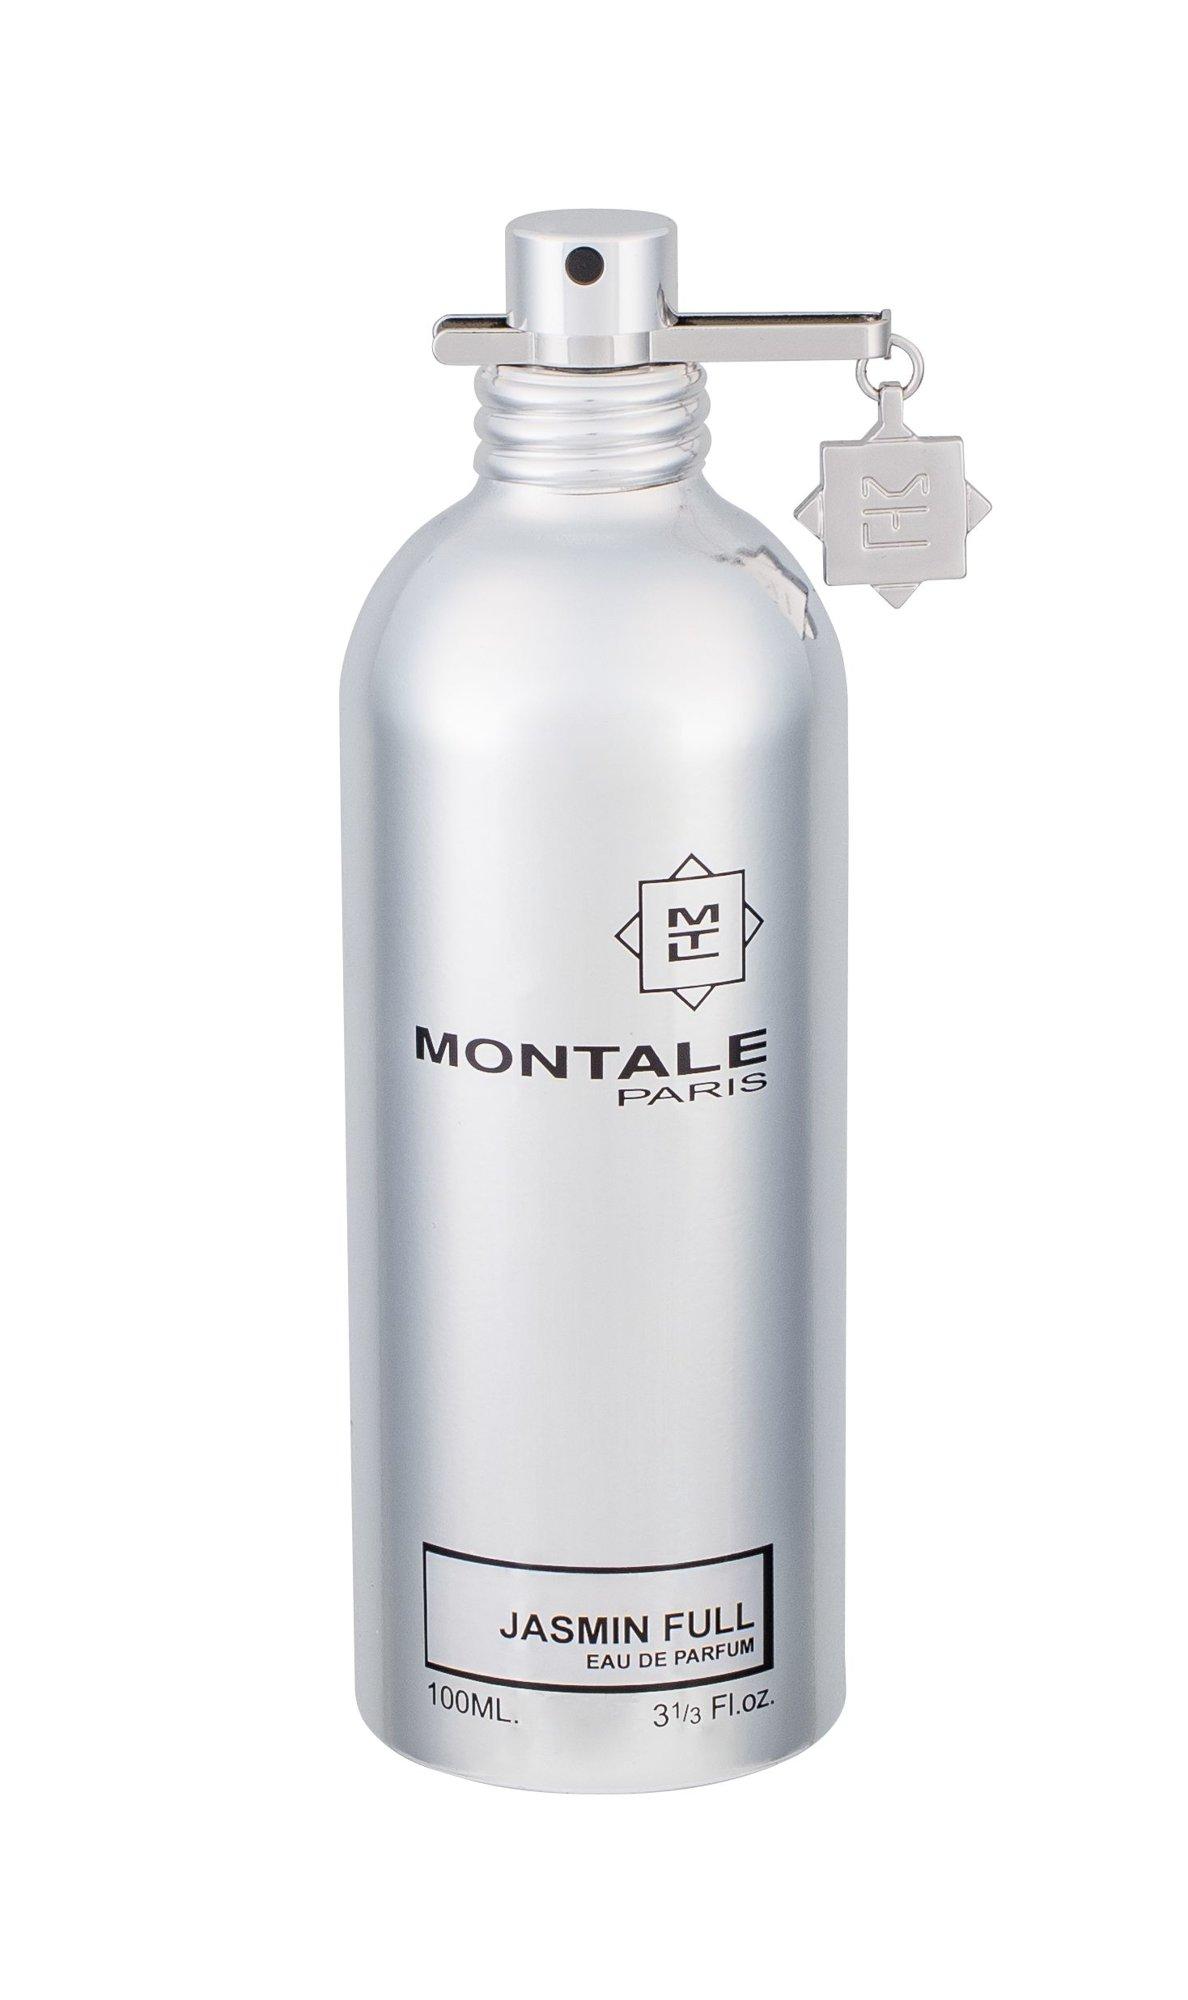 Montale Paris Jasmin Full, Parfumovaná voda 100ml